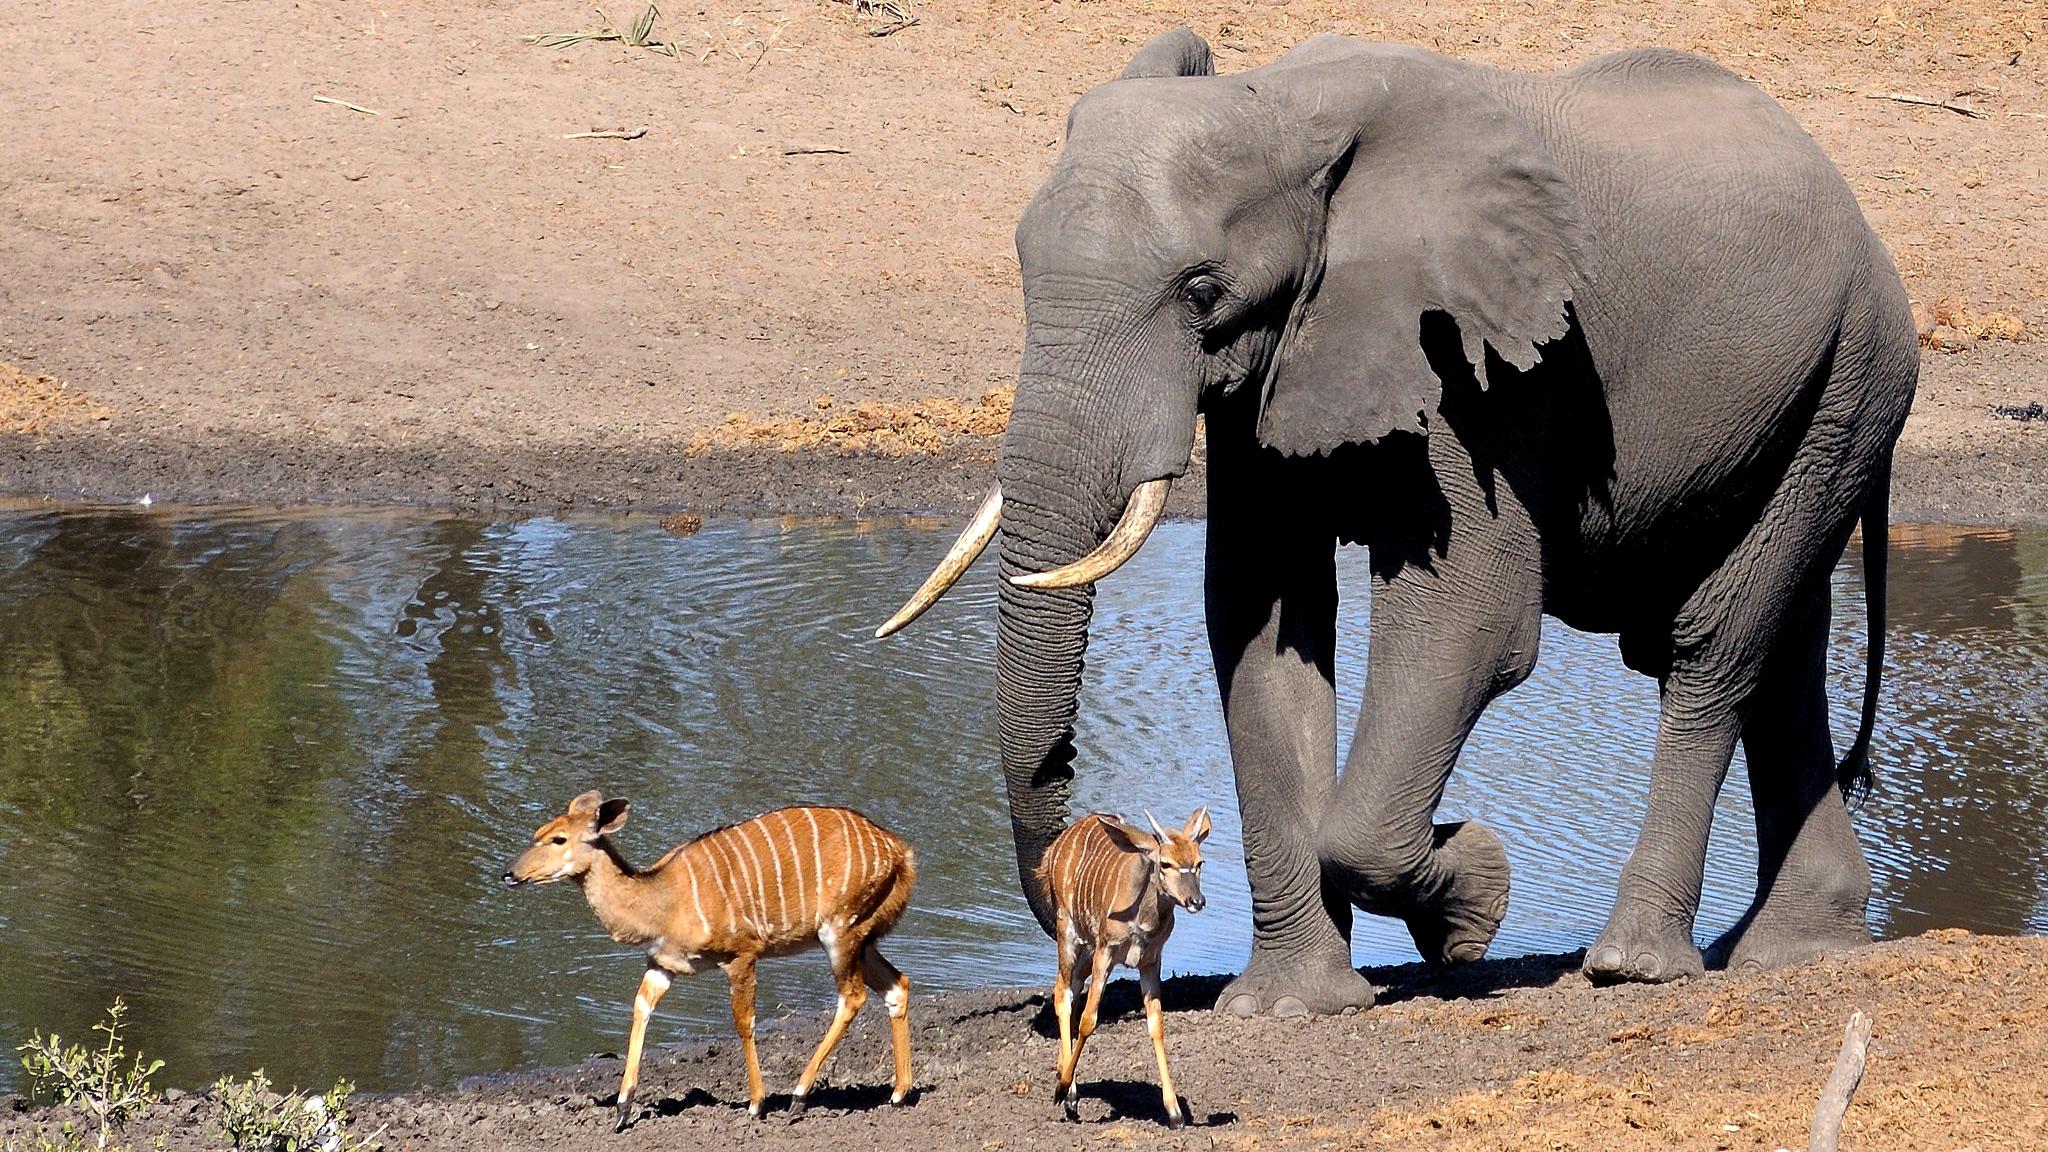 Tembe Elephant Park, South Africa. (Andrew Ashton / Flickr)